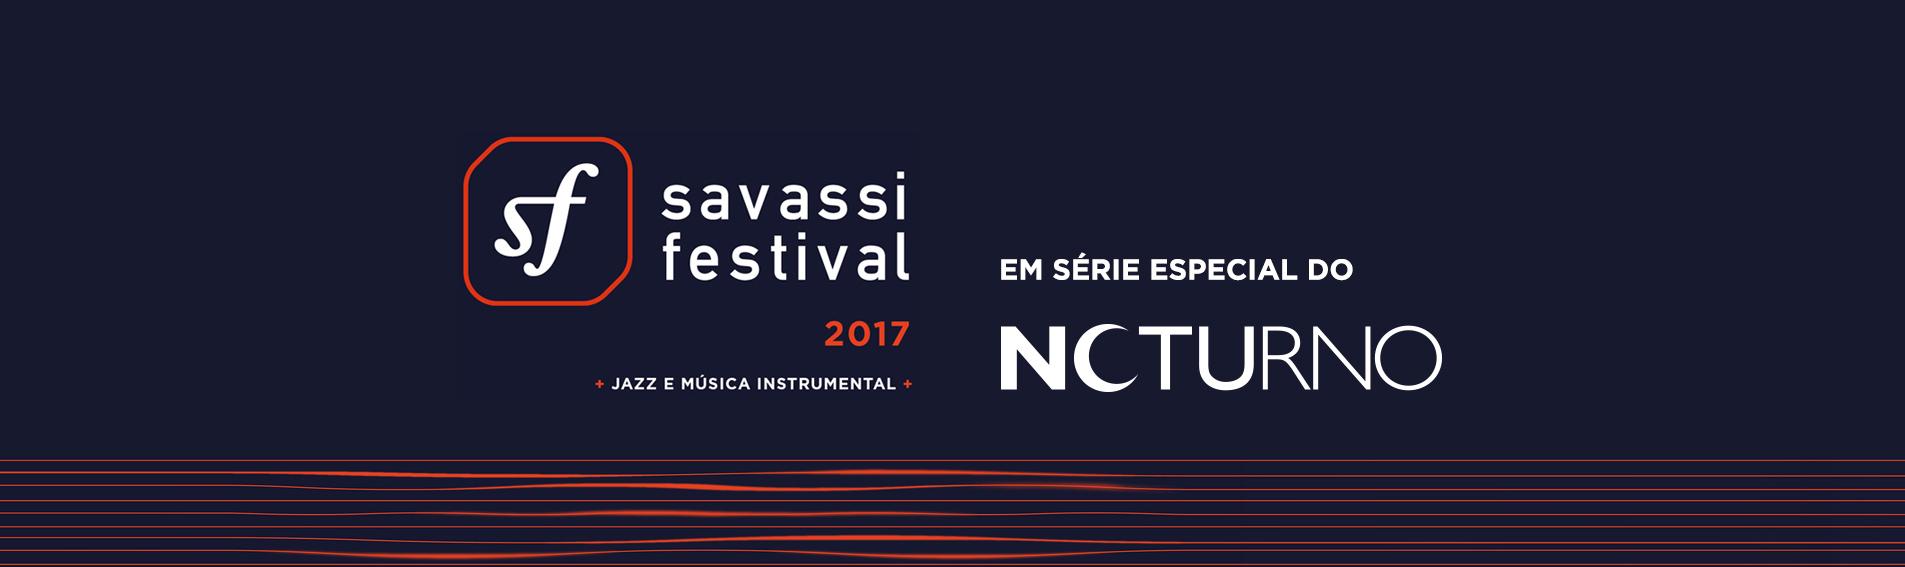 banner_savassi_festival-site